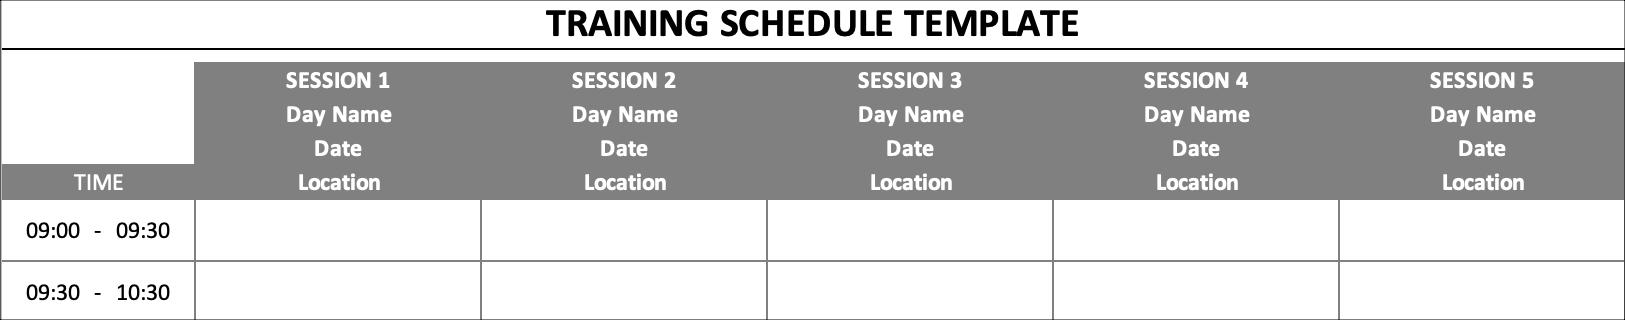 Training Schedule Basics